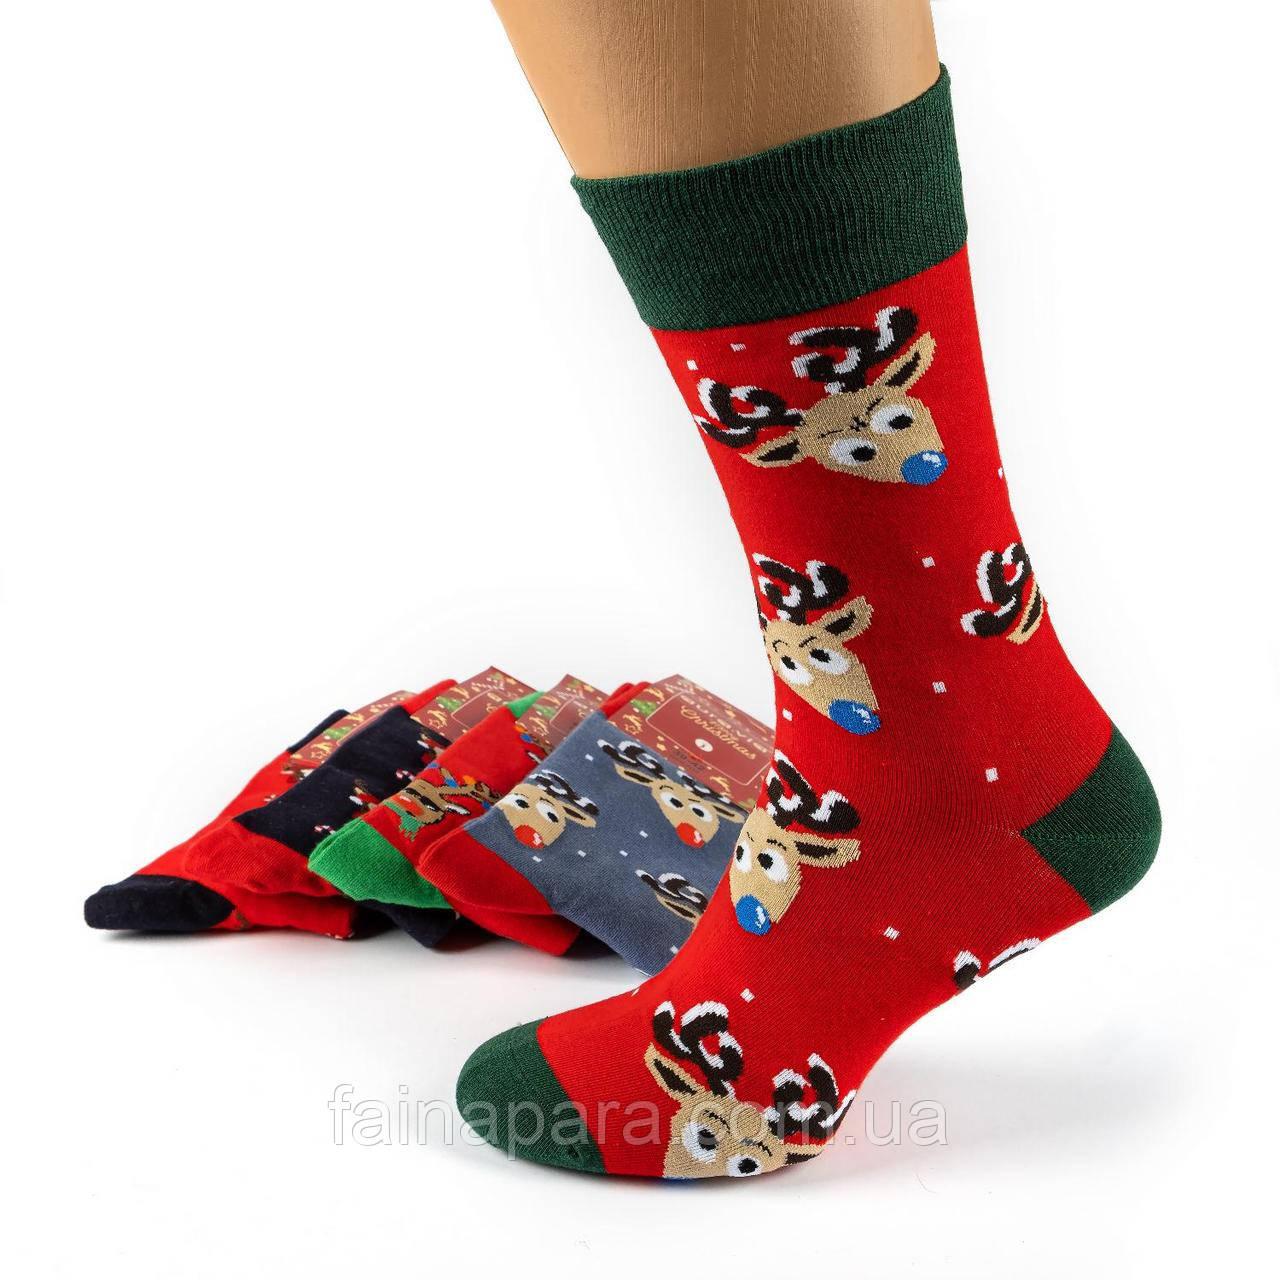 Новогодний набор мужских носков 5 пар